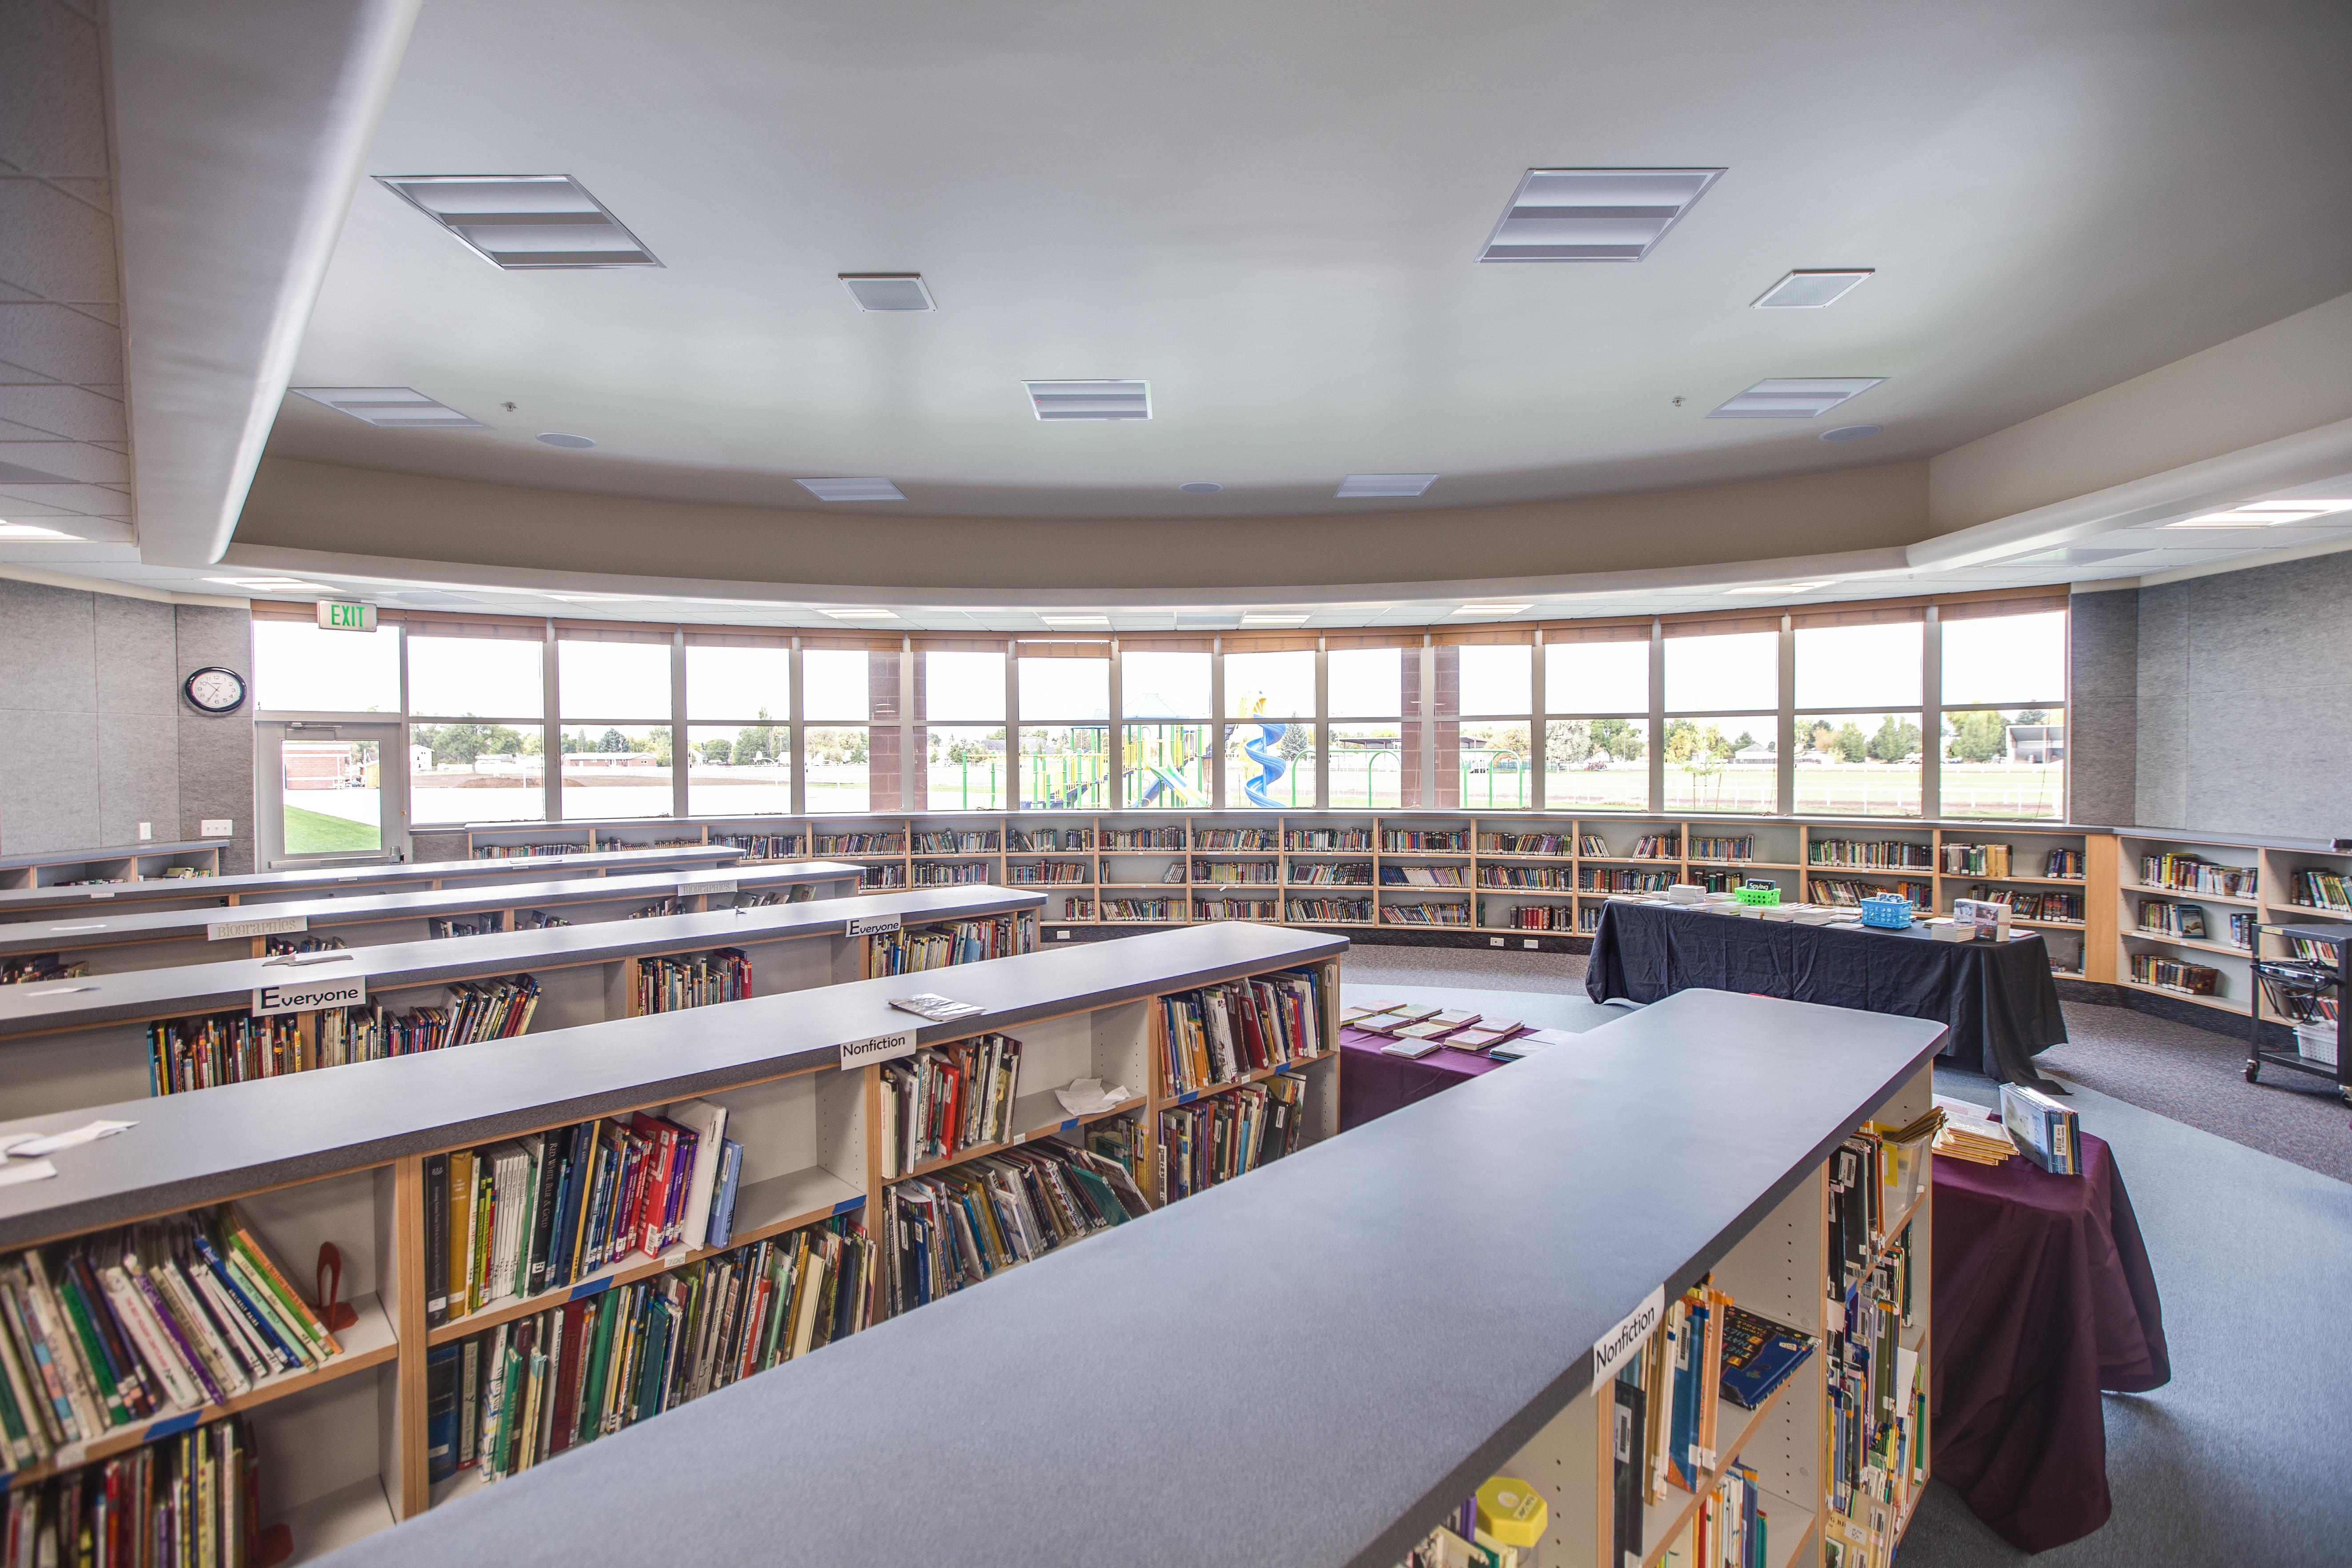 Lewiston Elementary School Library - Lewiston, UT